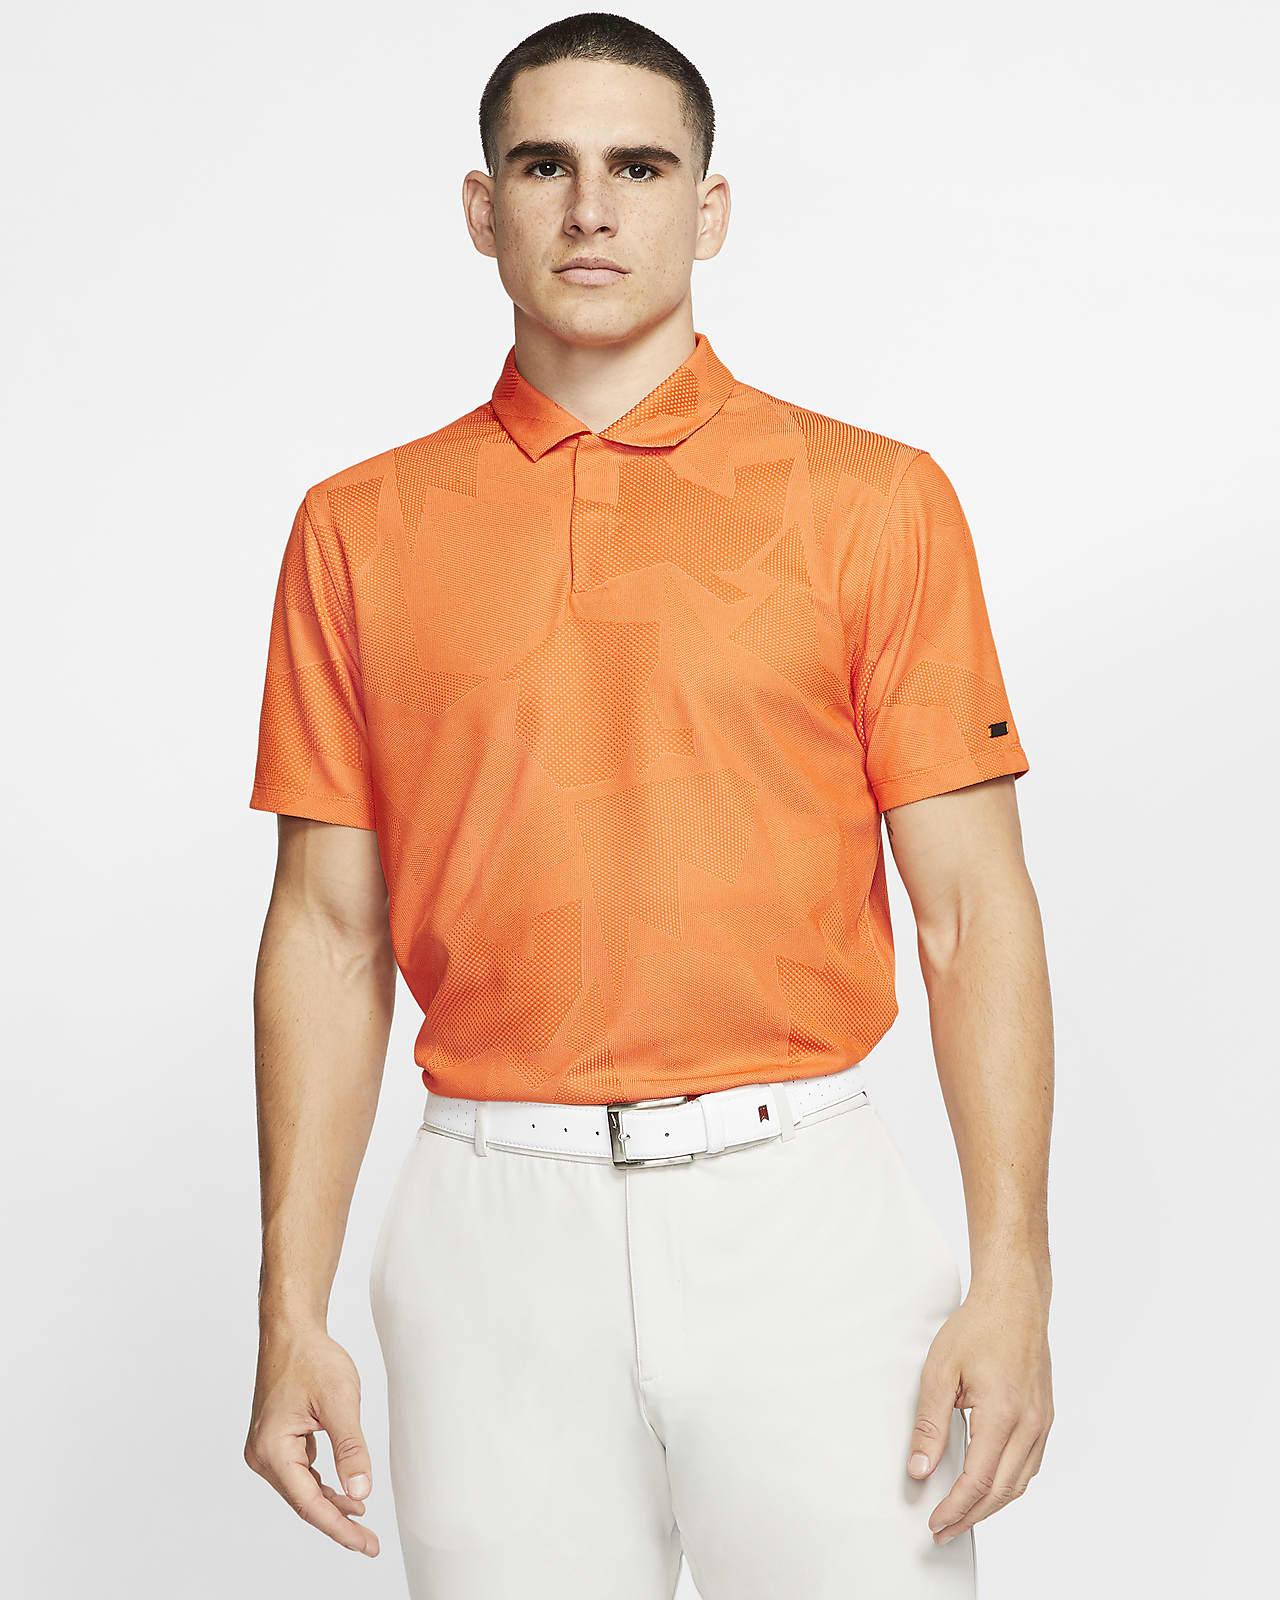 Nike Dri-FIT Tiger Woods Men's Camo Golf Polo